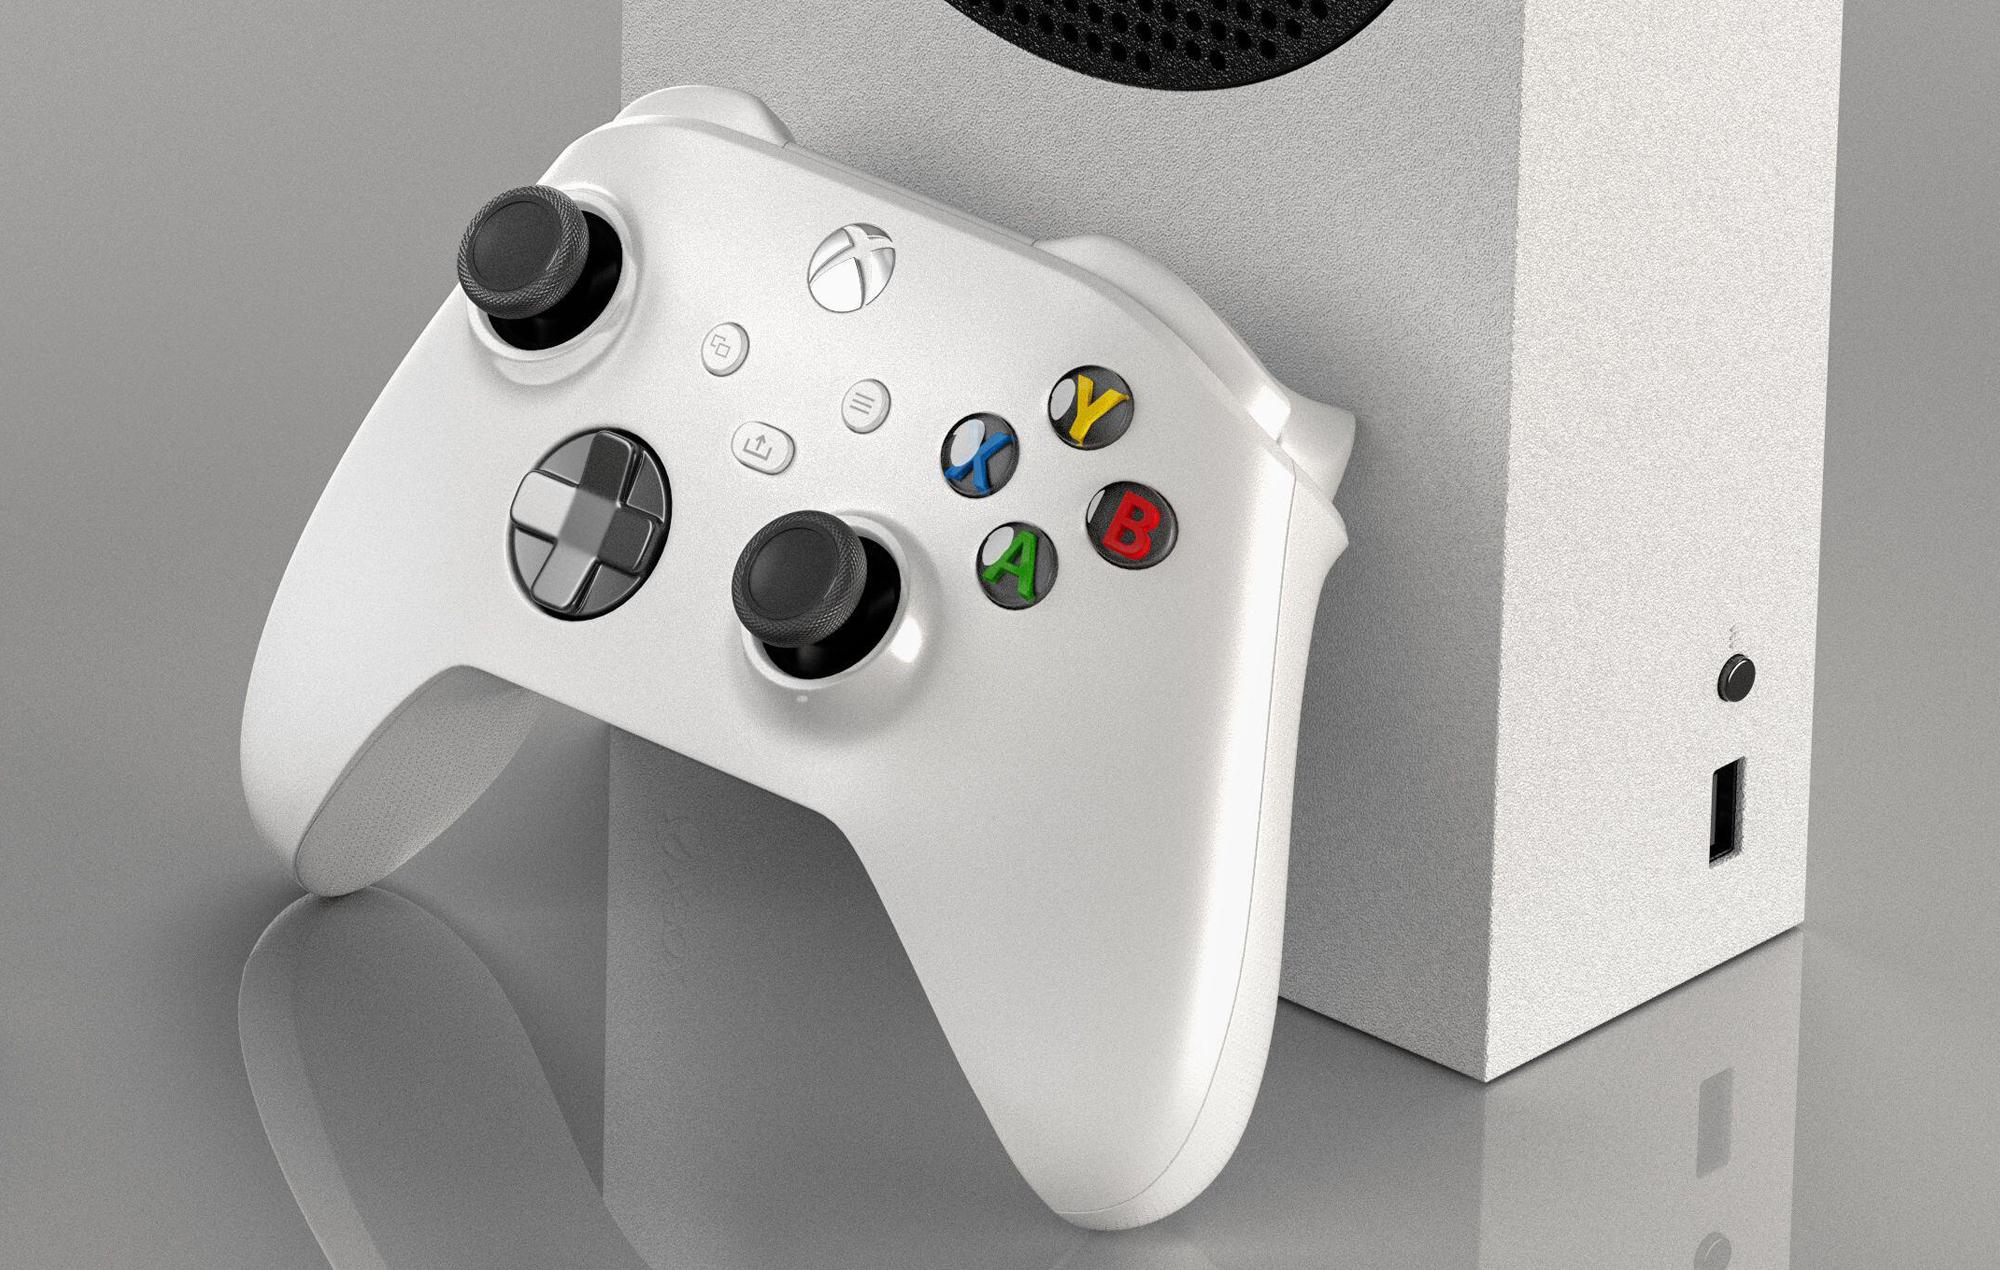 Microsoft Series S White Deals 499